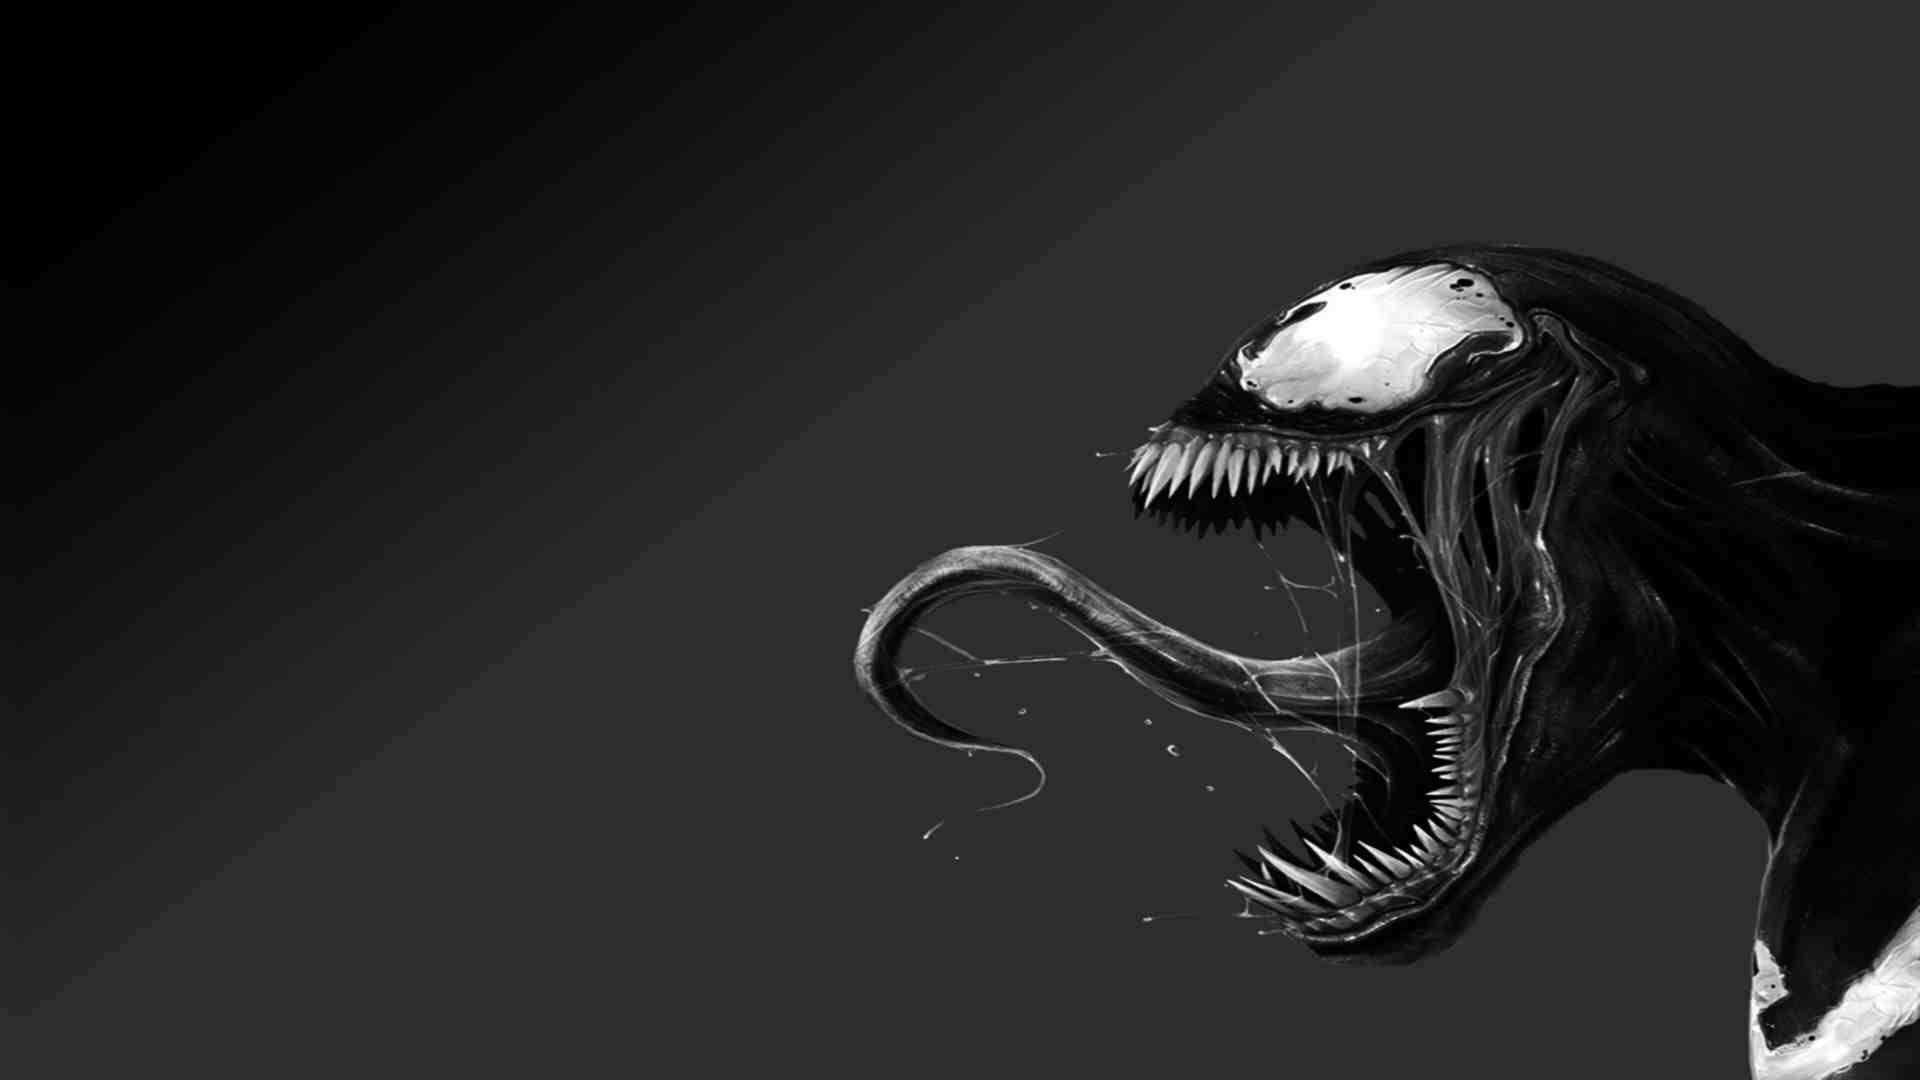 venom wallpaper hd 1920x1080 - photo #16